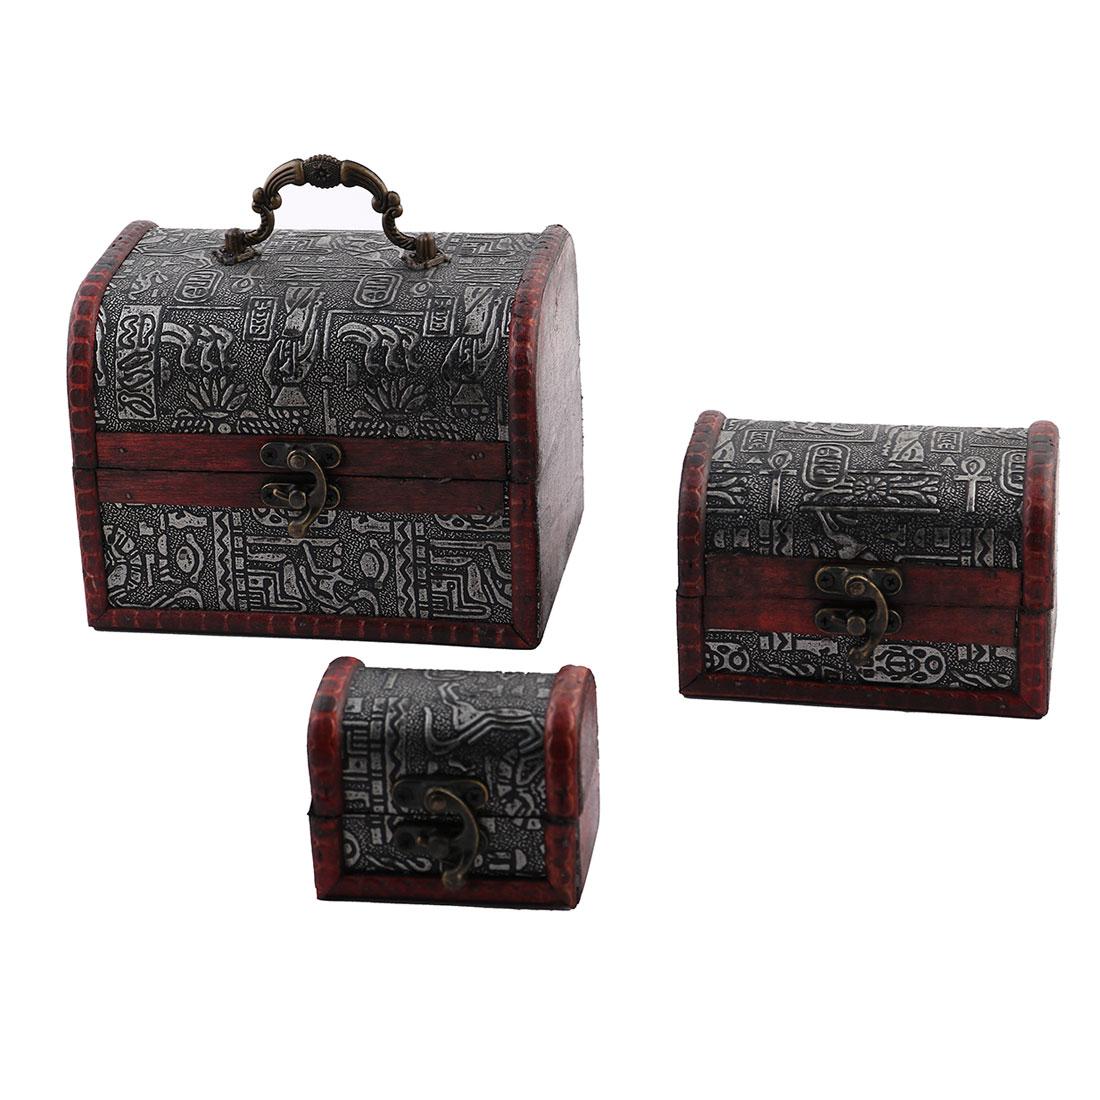 Bedroom Metal Lock Wooden Vintage Style Necklace Jewelry Storage Box 3 in 1